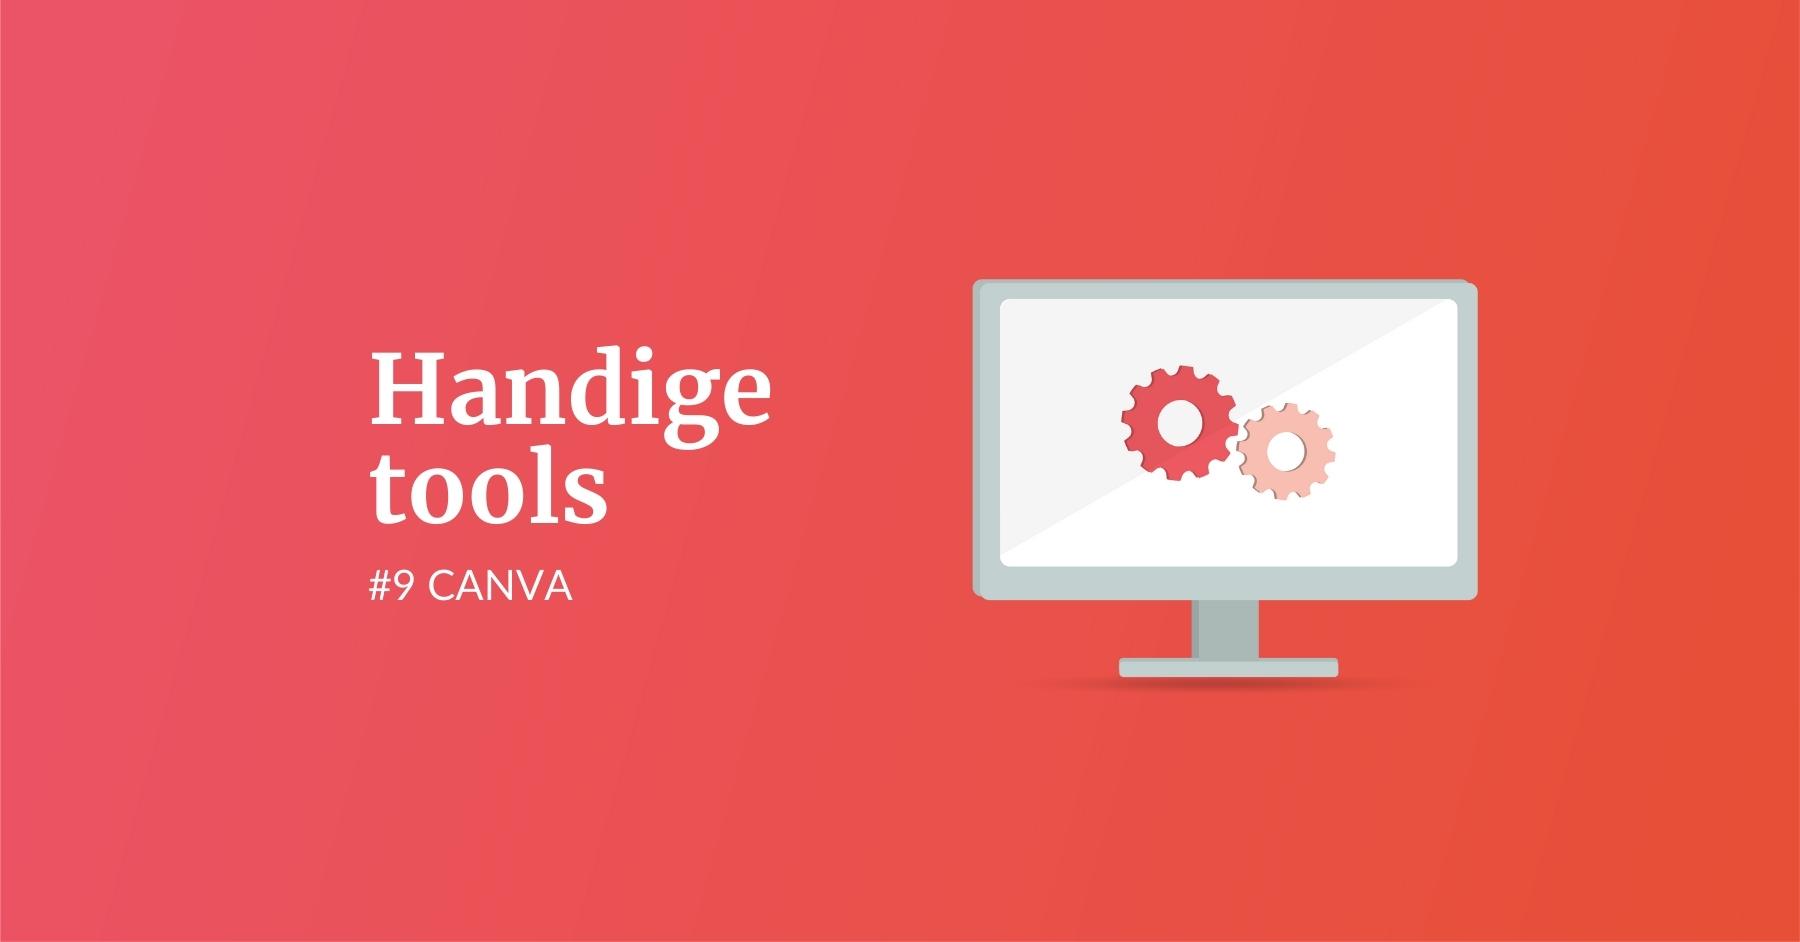 Handige tools #9 CANVA